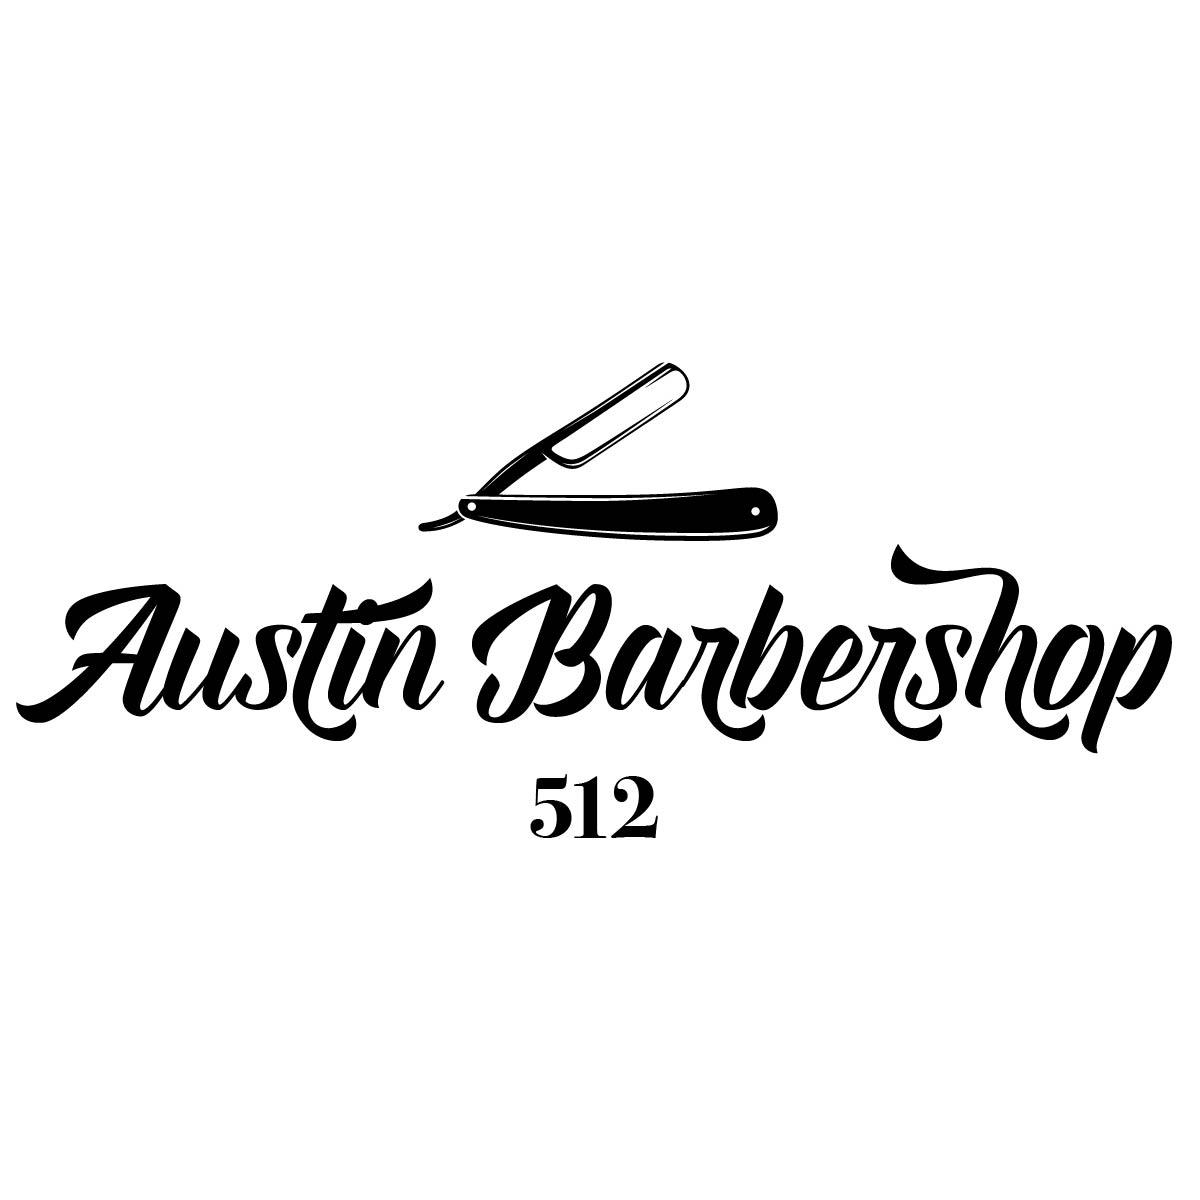 Austin_Barbeshop-01.jpg